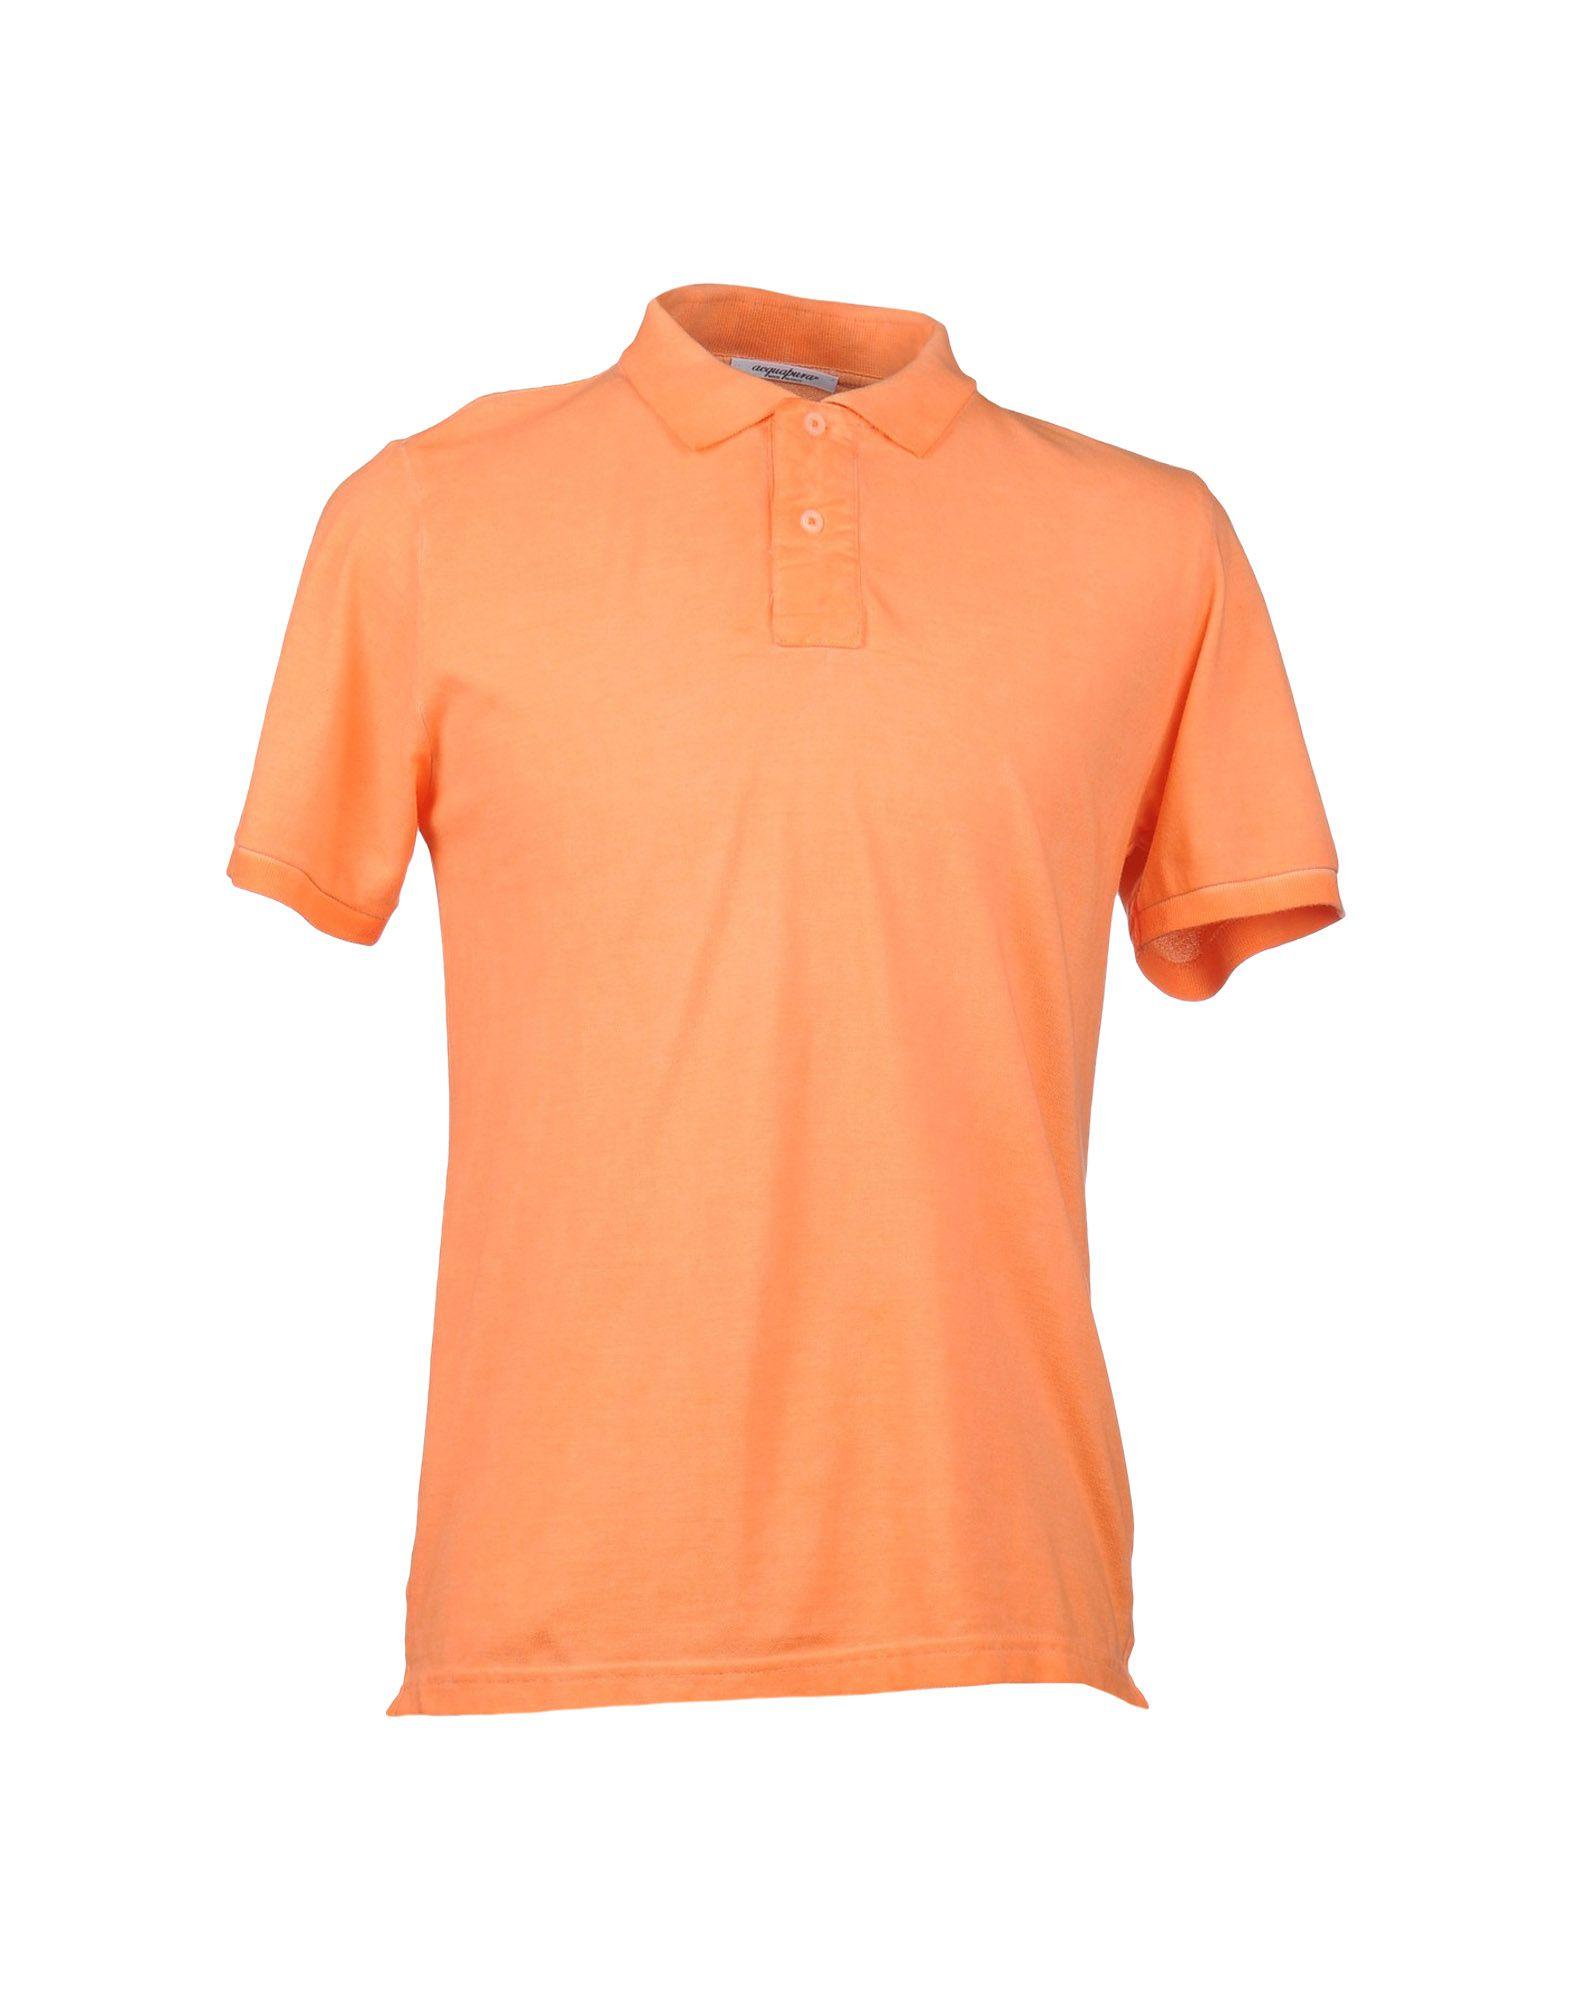 Acquapura polo shirt in orange for men lyst for Orange polo shirt mens